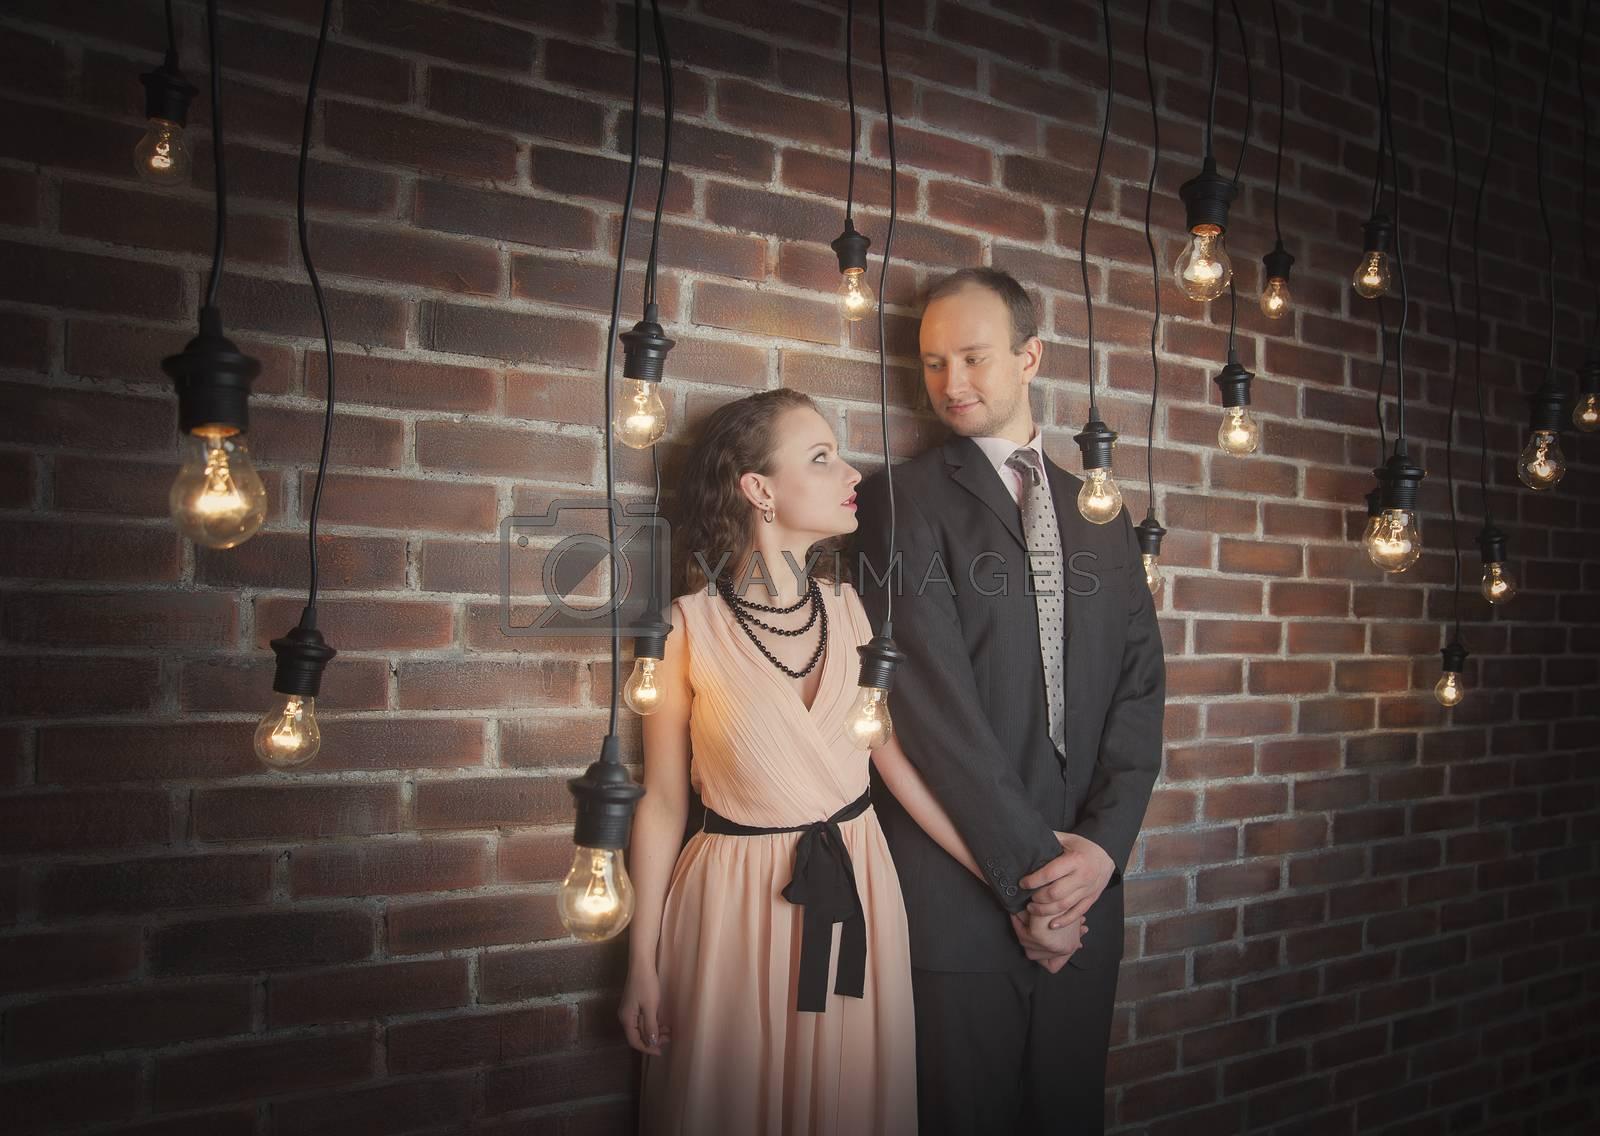 amazing couple portraits by raduga21